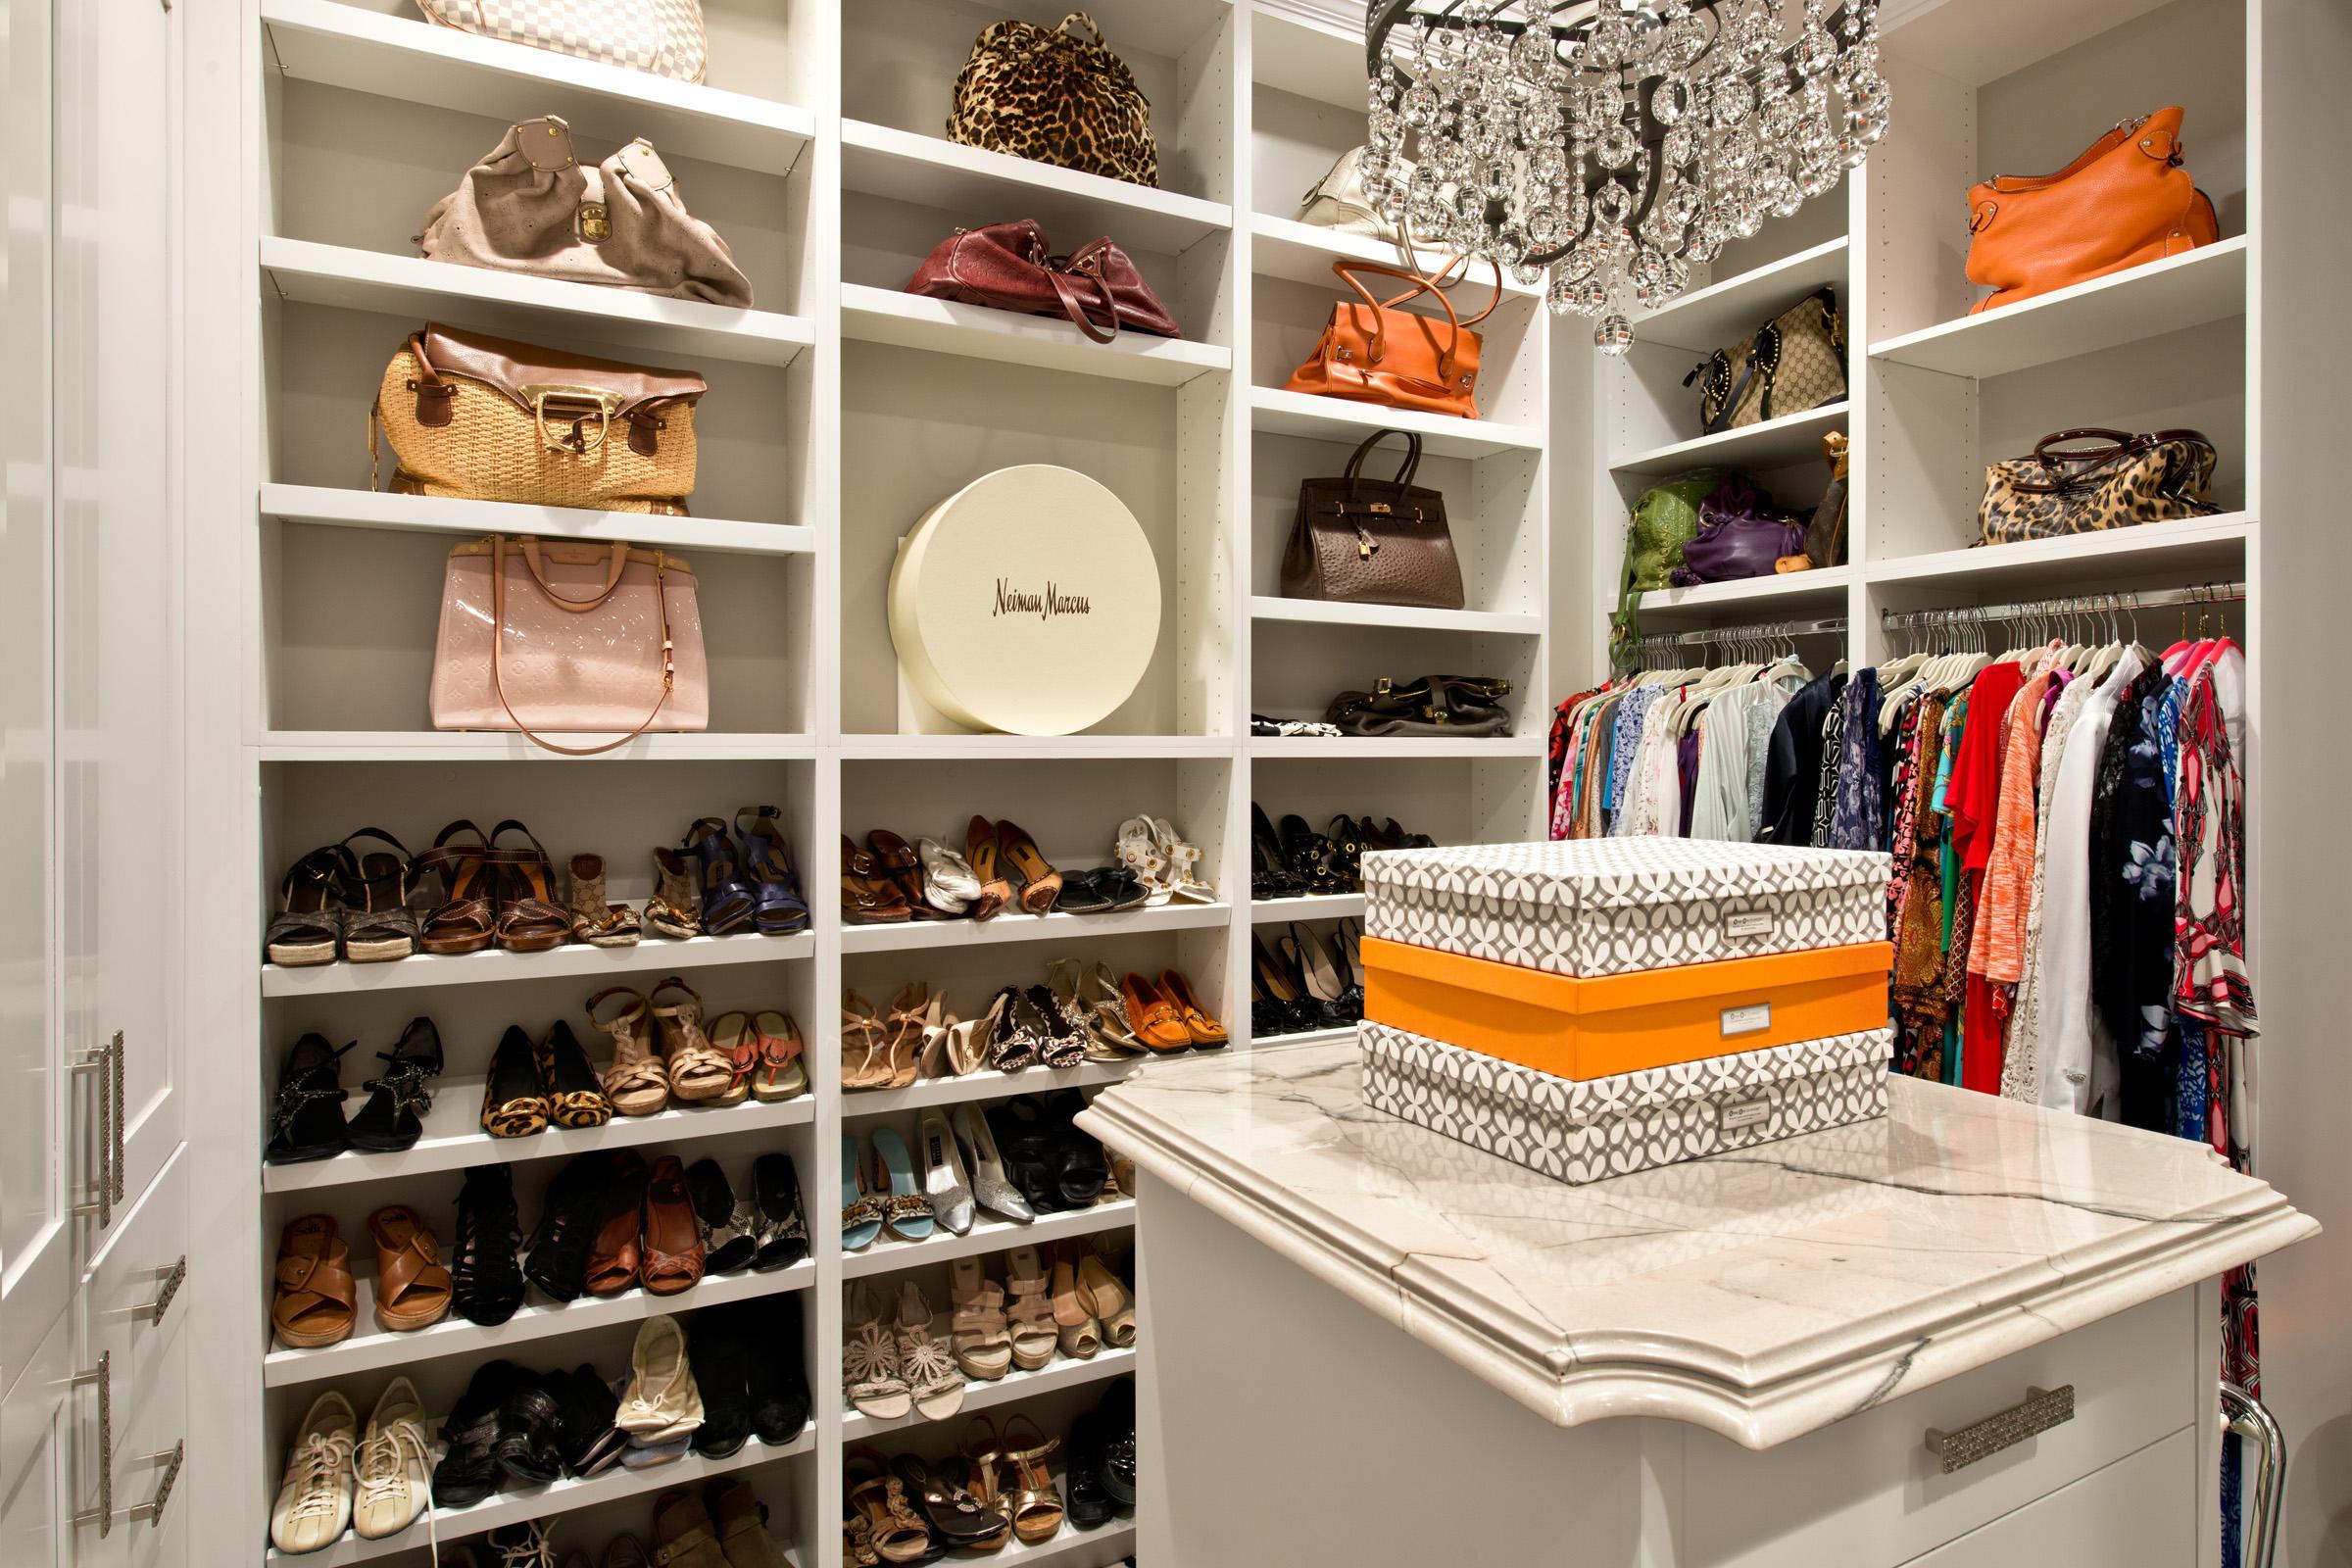 Now that's a Closet!